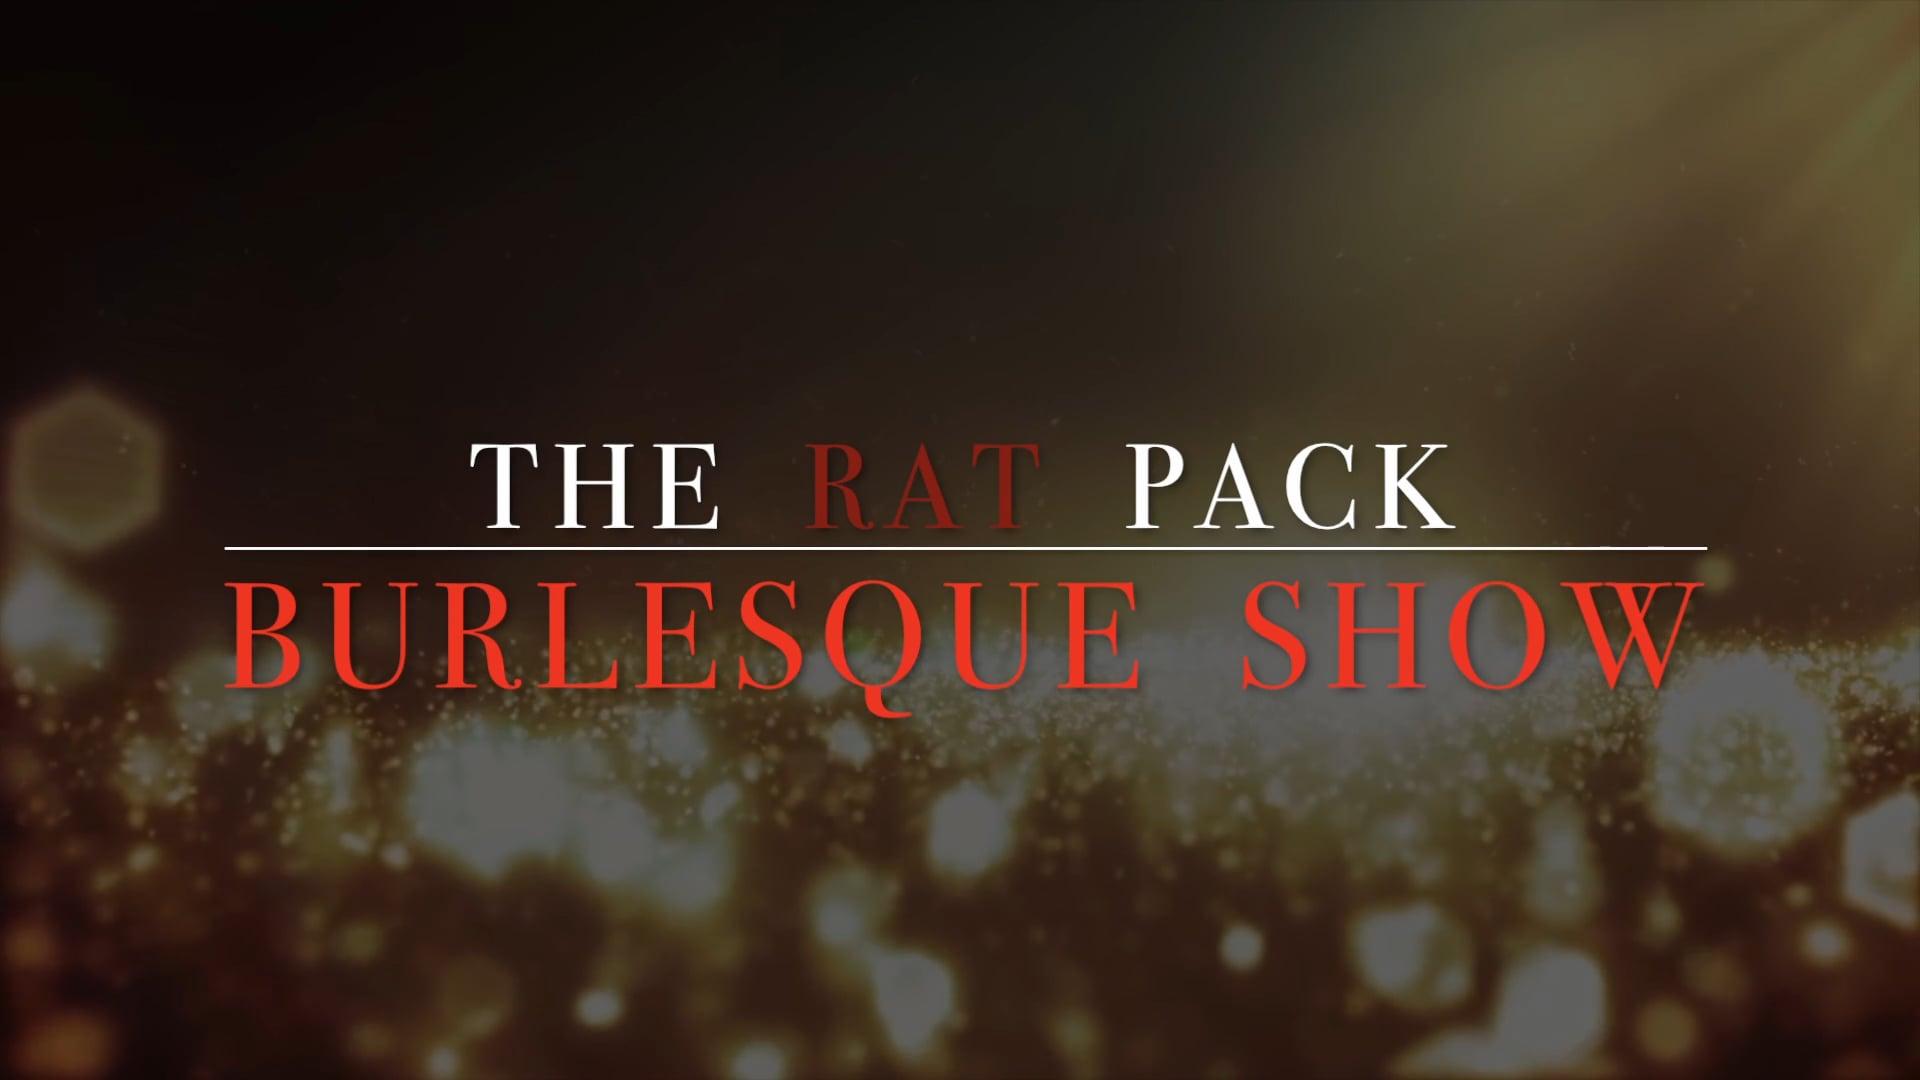 The Rat Pack Burlesque Show (promo)